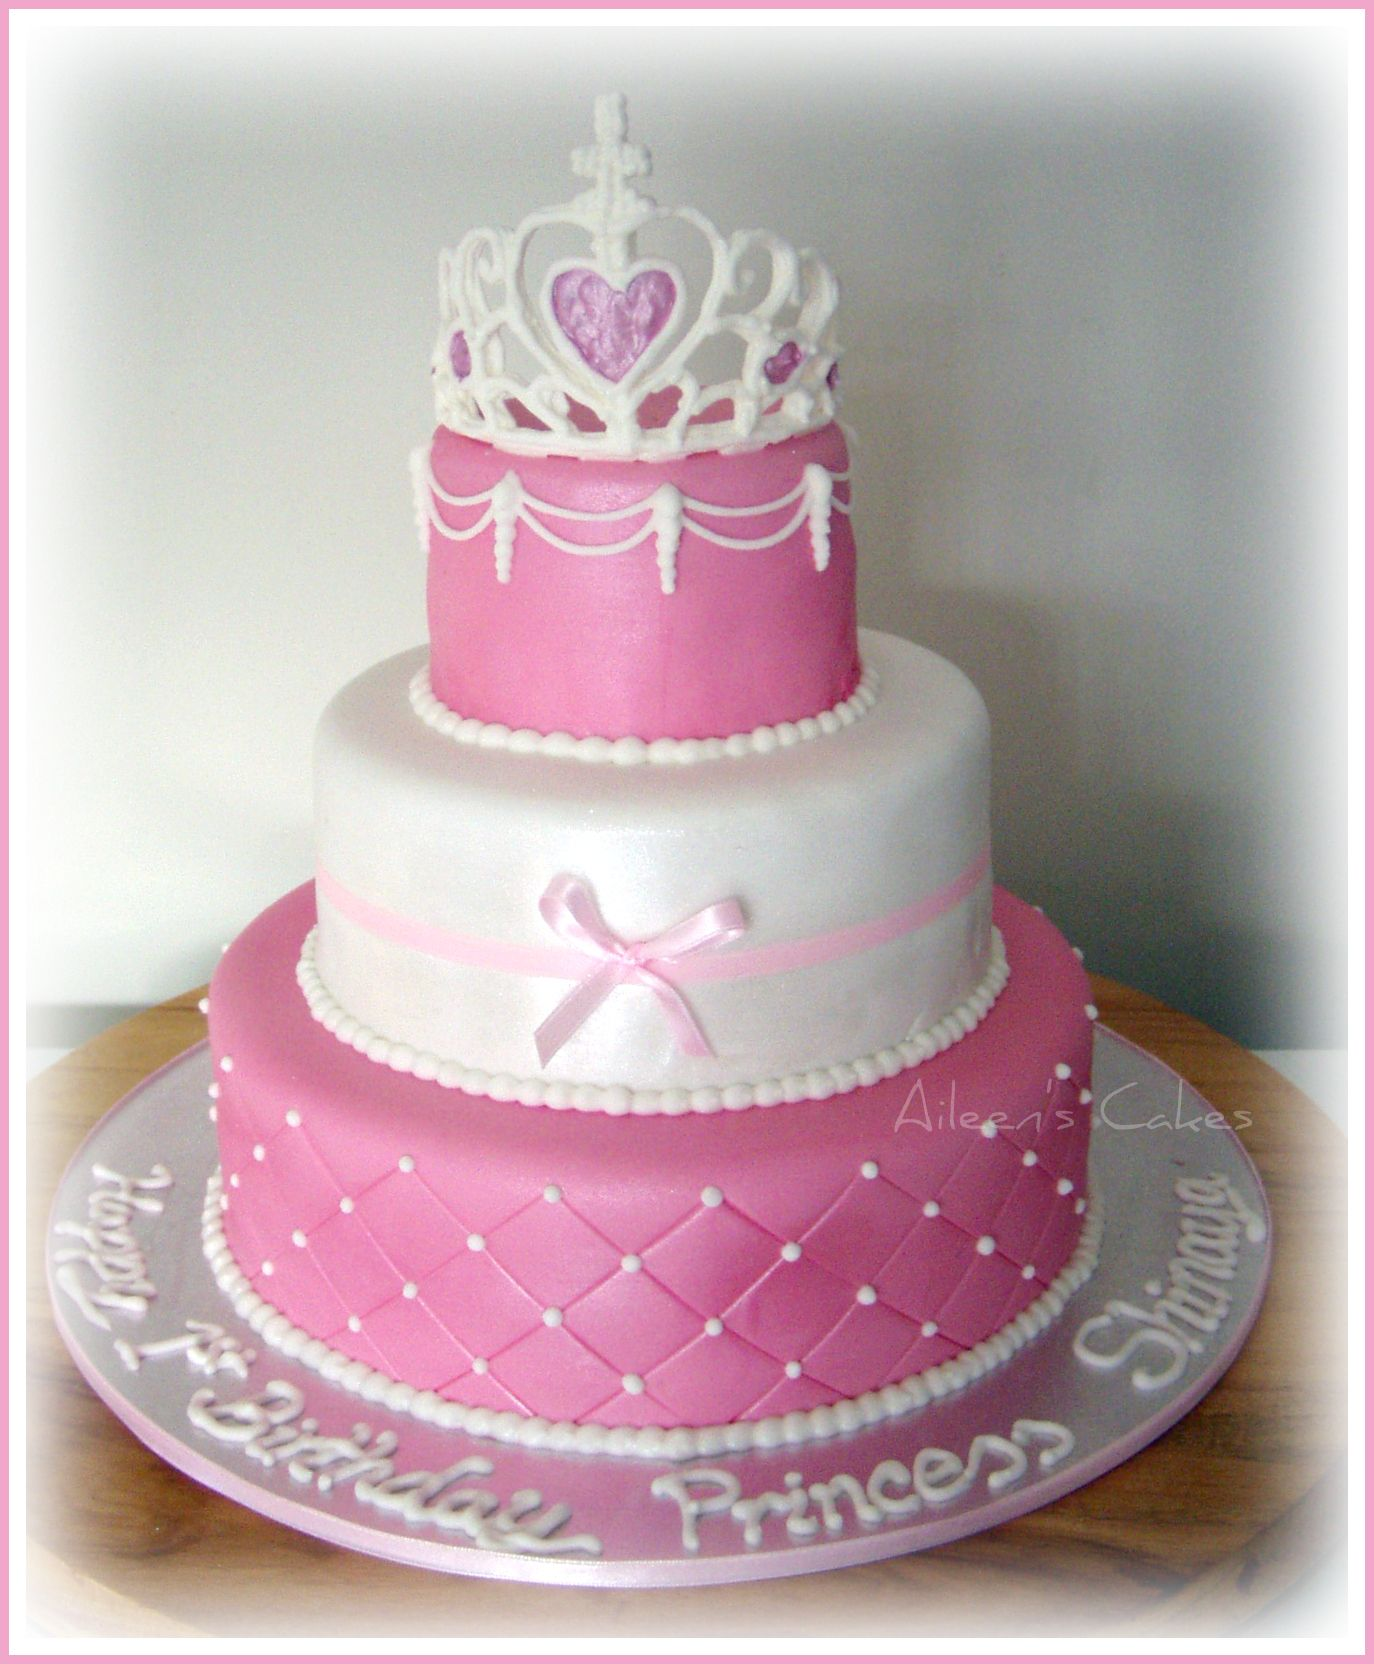 Two Layer Circular Vanilla Cake With Fondant